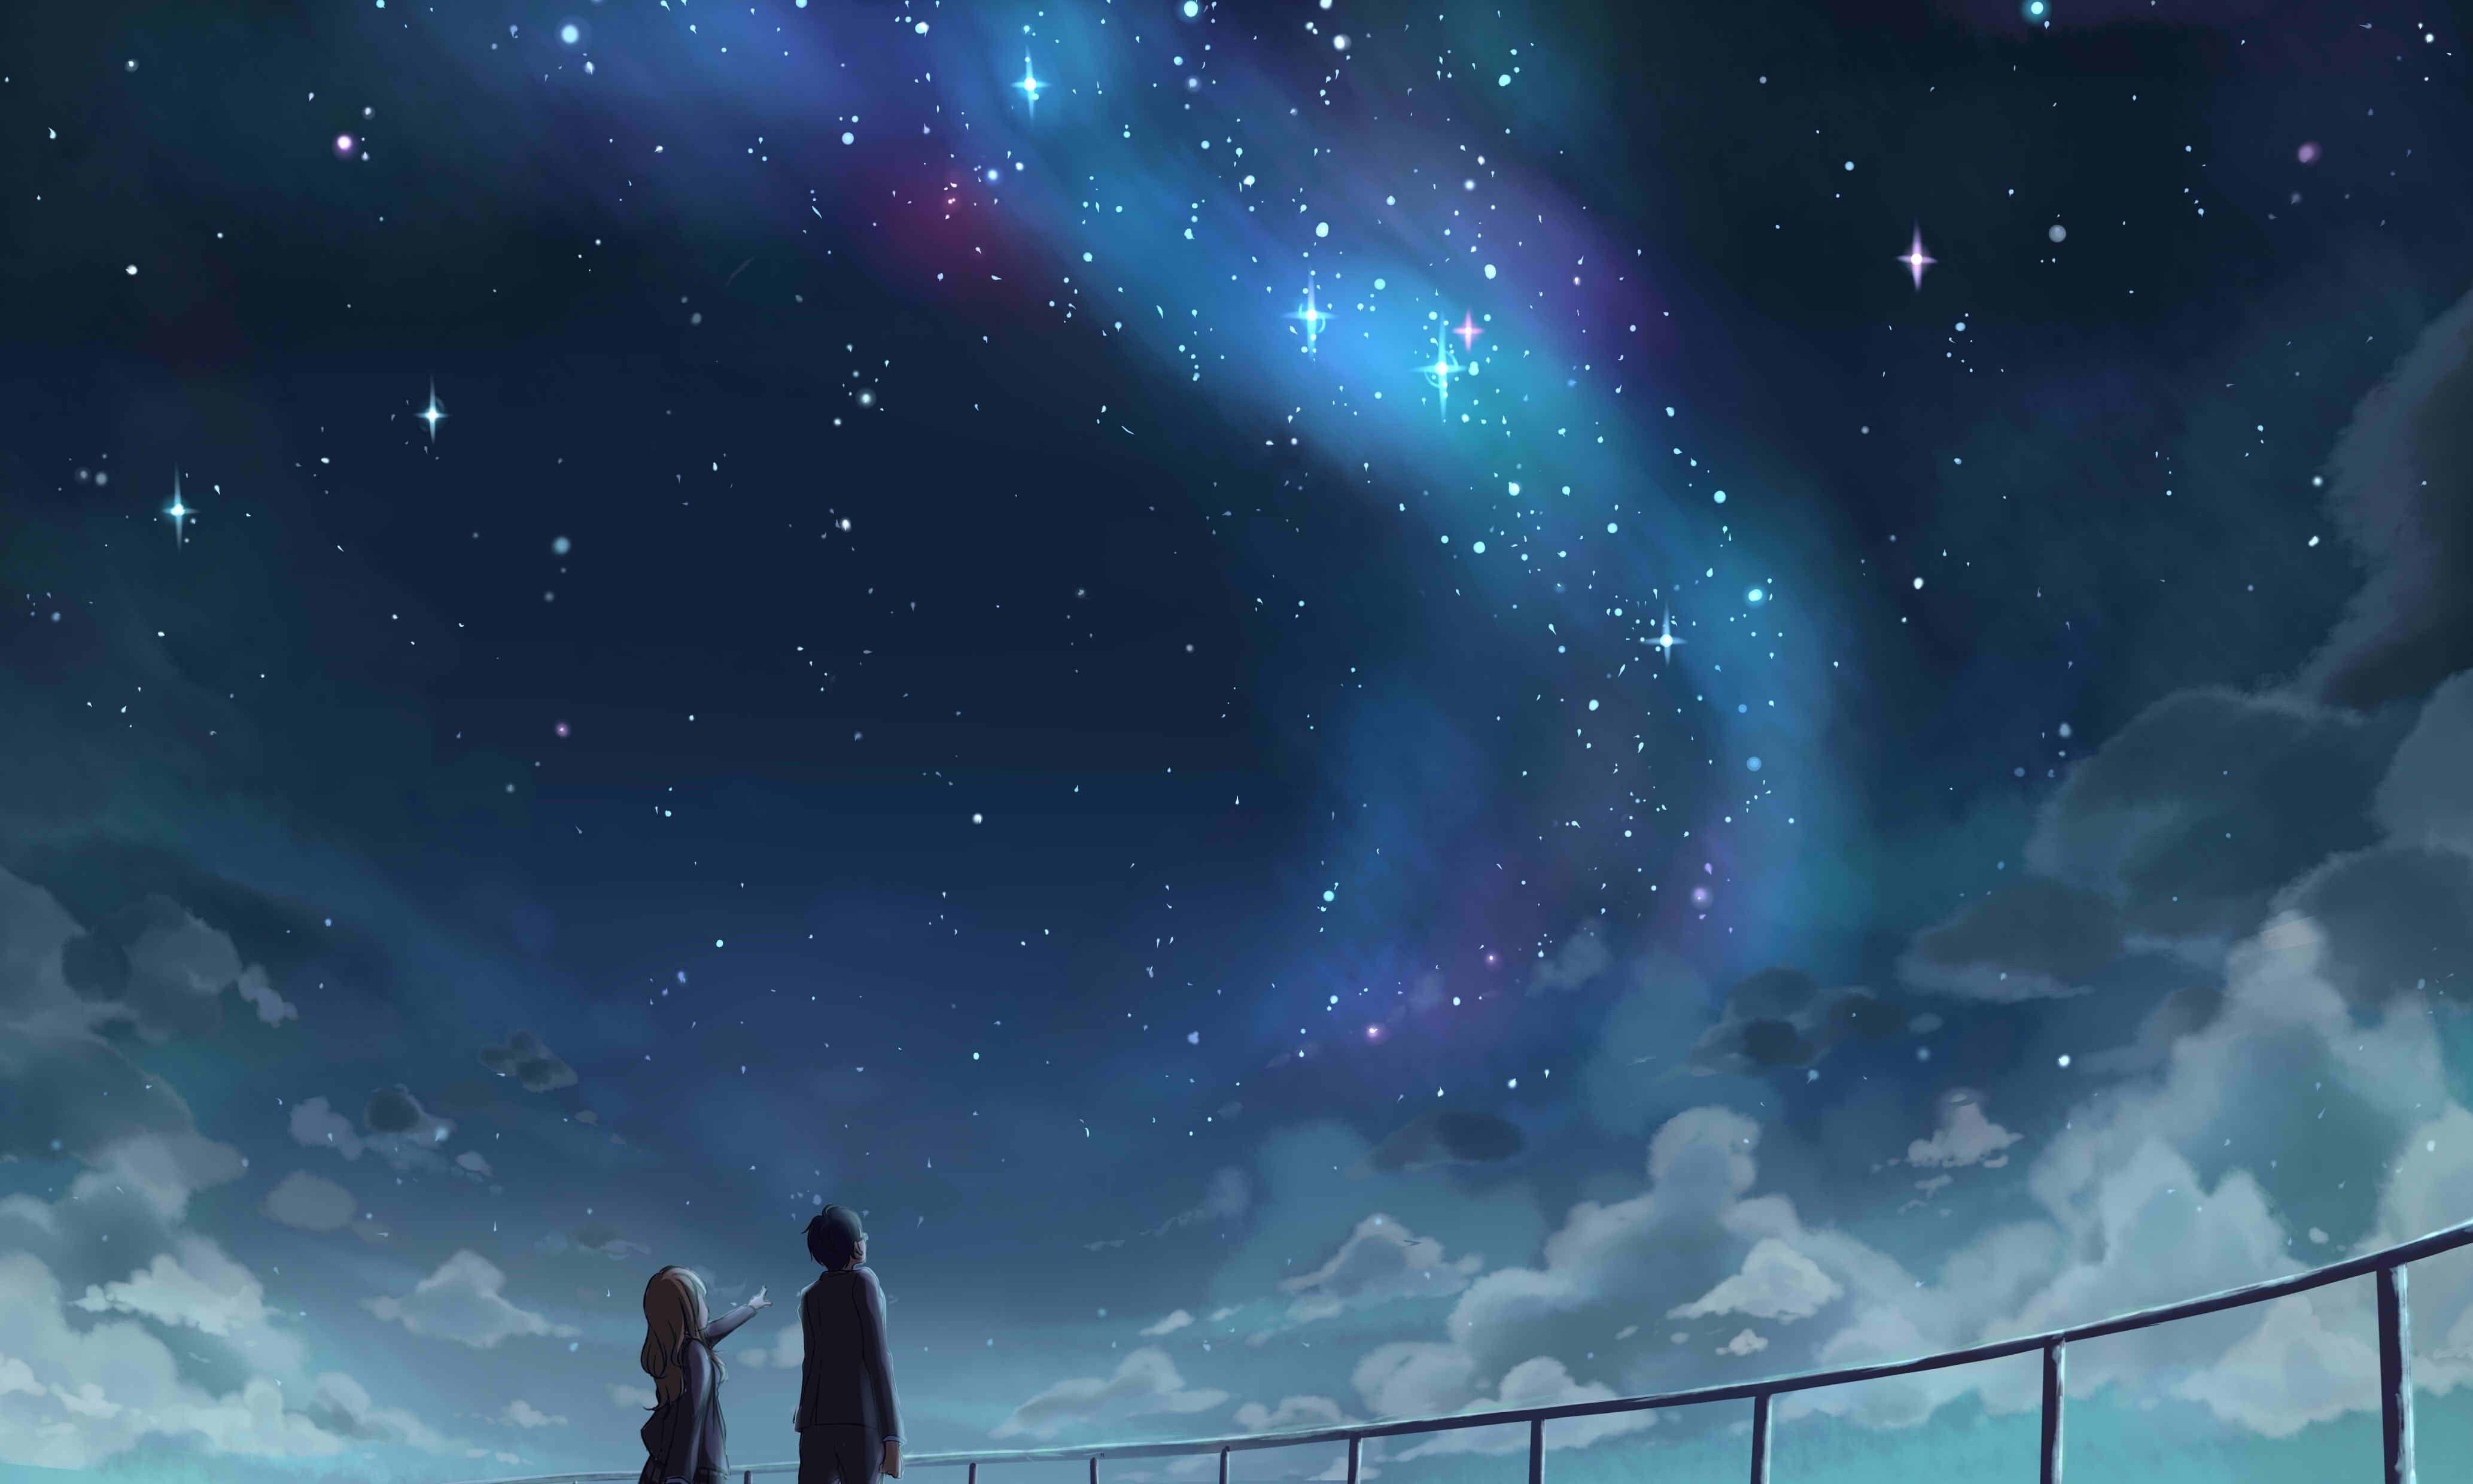 Aesthetic Anime Stars Wallpapers Wallpaper Cave